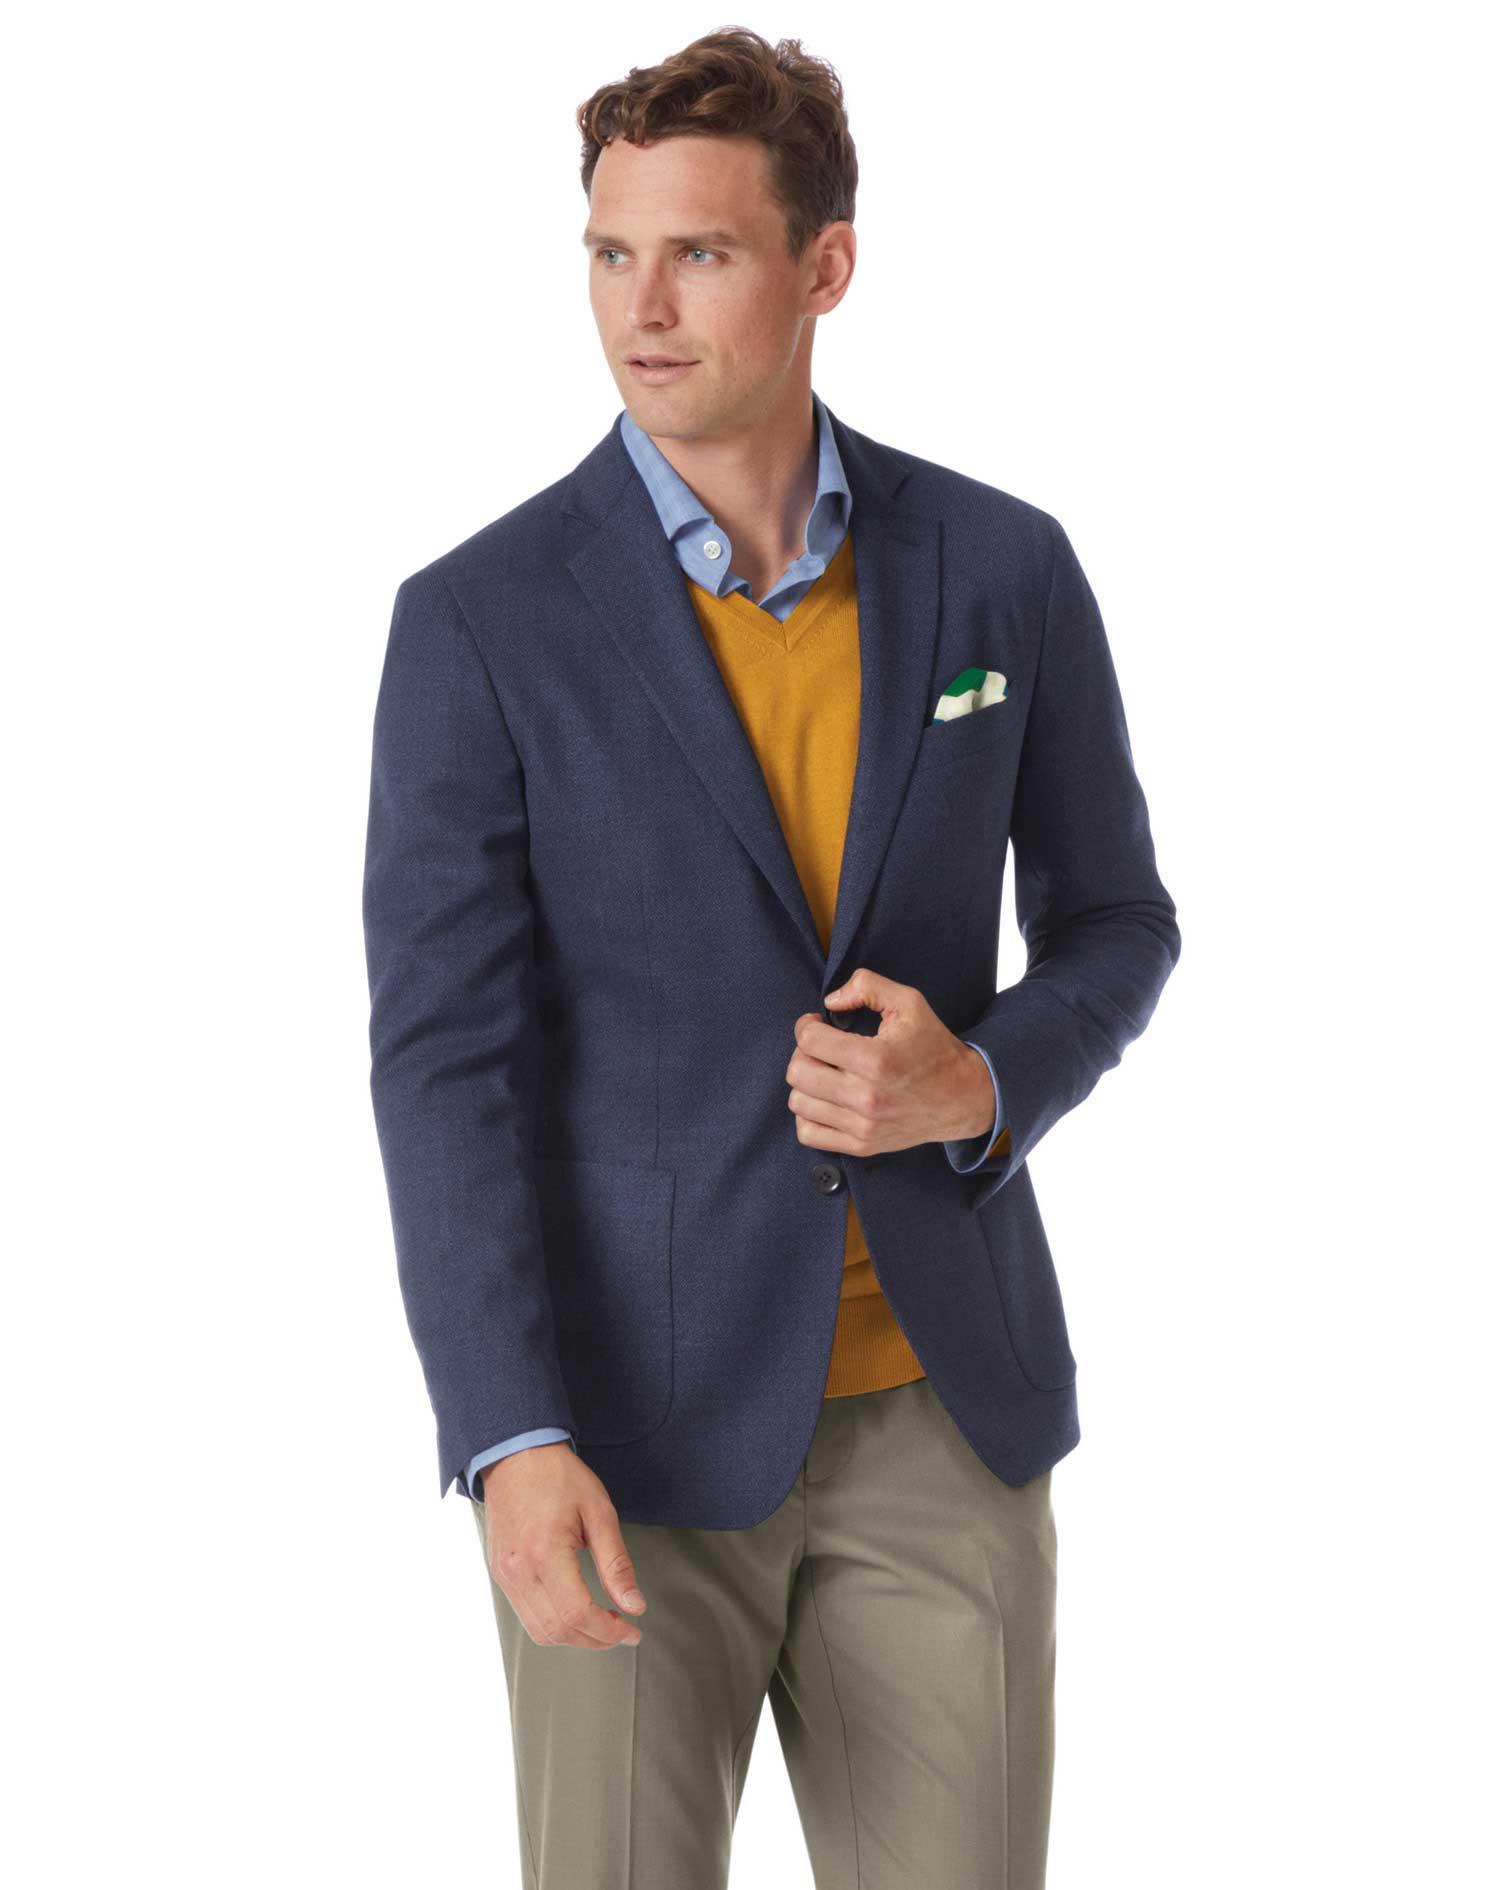 Slim Fit Indigo Blue Italian Wool Blazer Size 40 Long by Charles Tyrwhitt